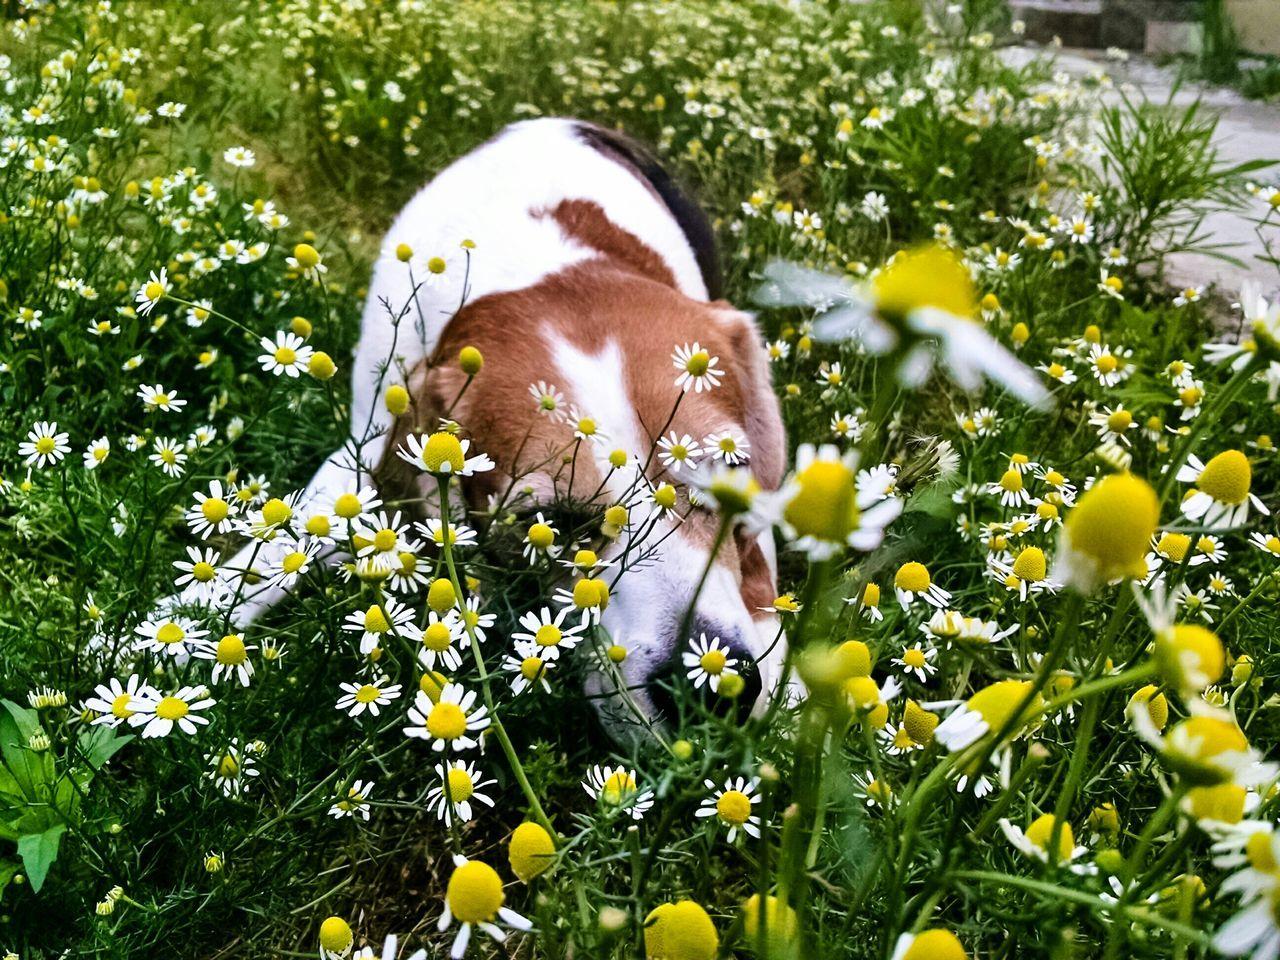 Enjoying nature Beagle Dogs Relaxing Hound Cute Pets Flowers Nature Grass